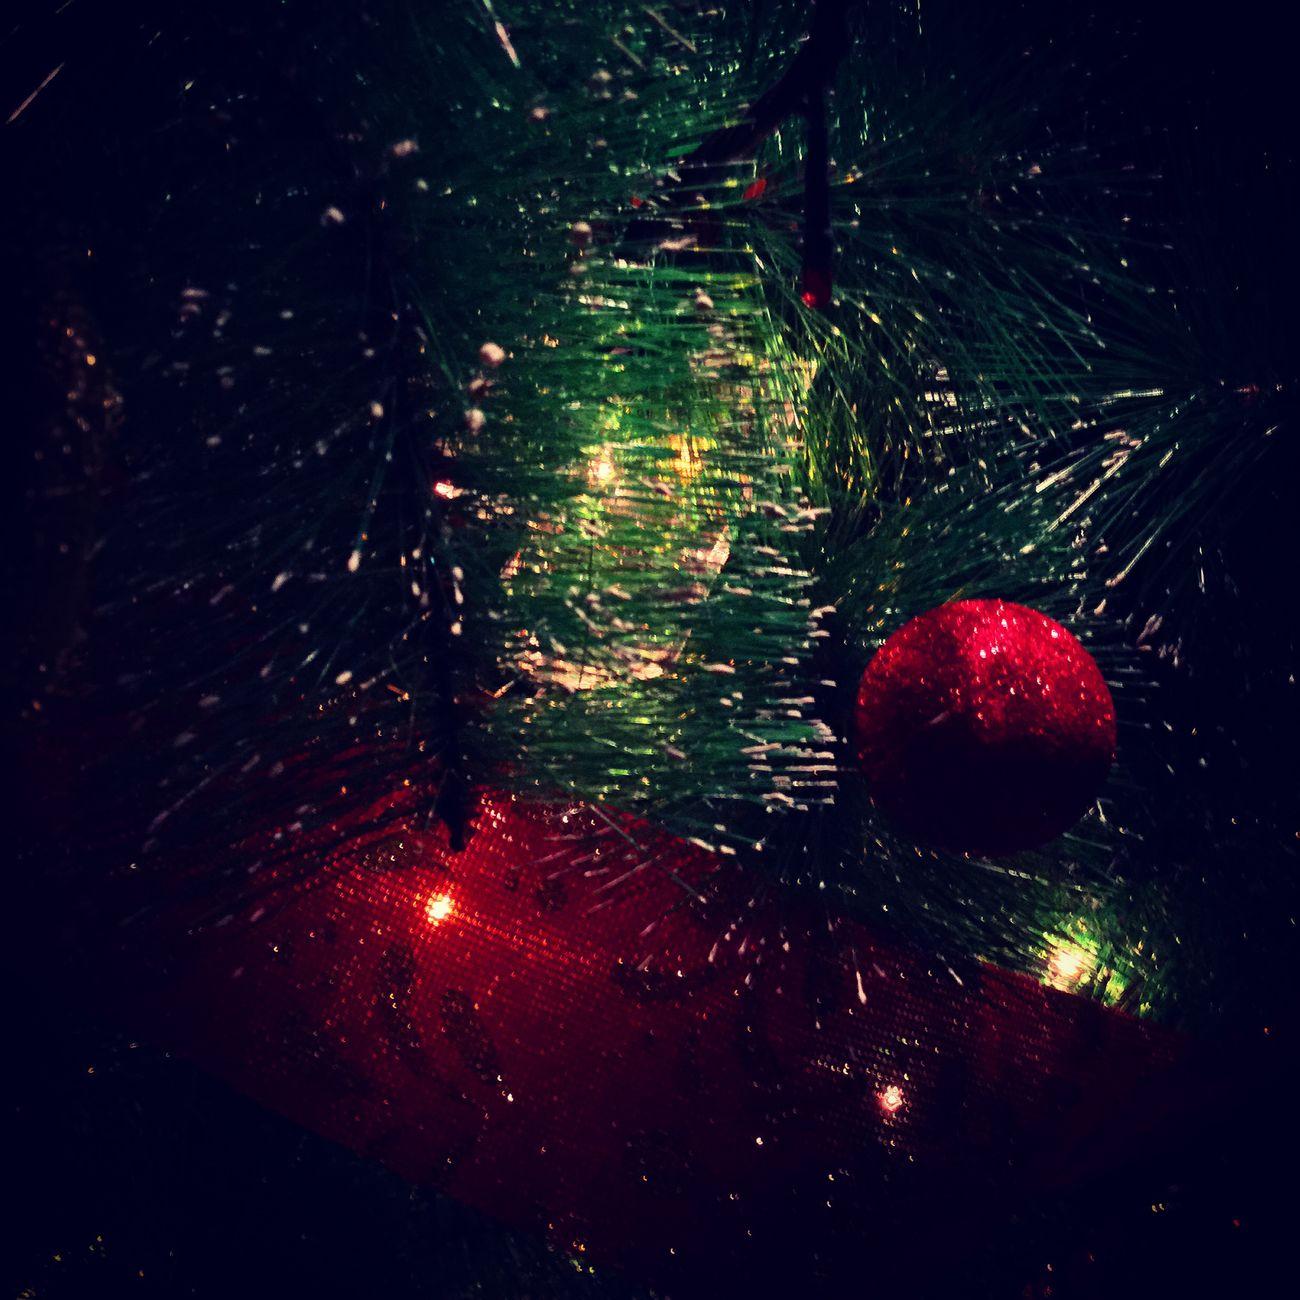 Lastdayofchristmas